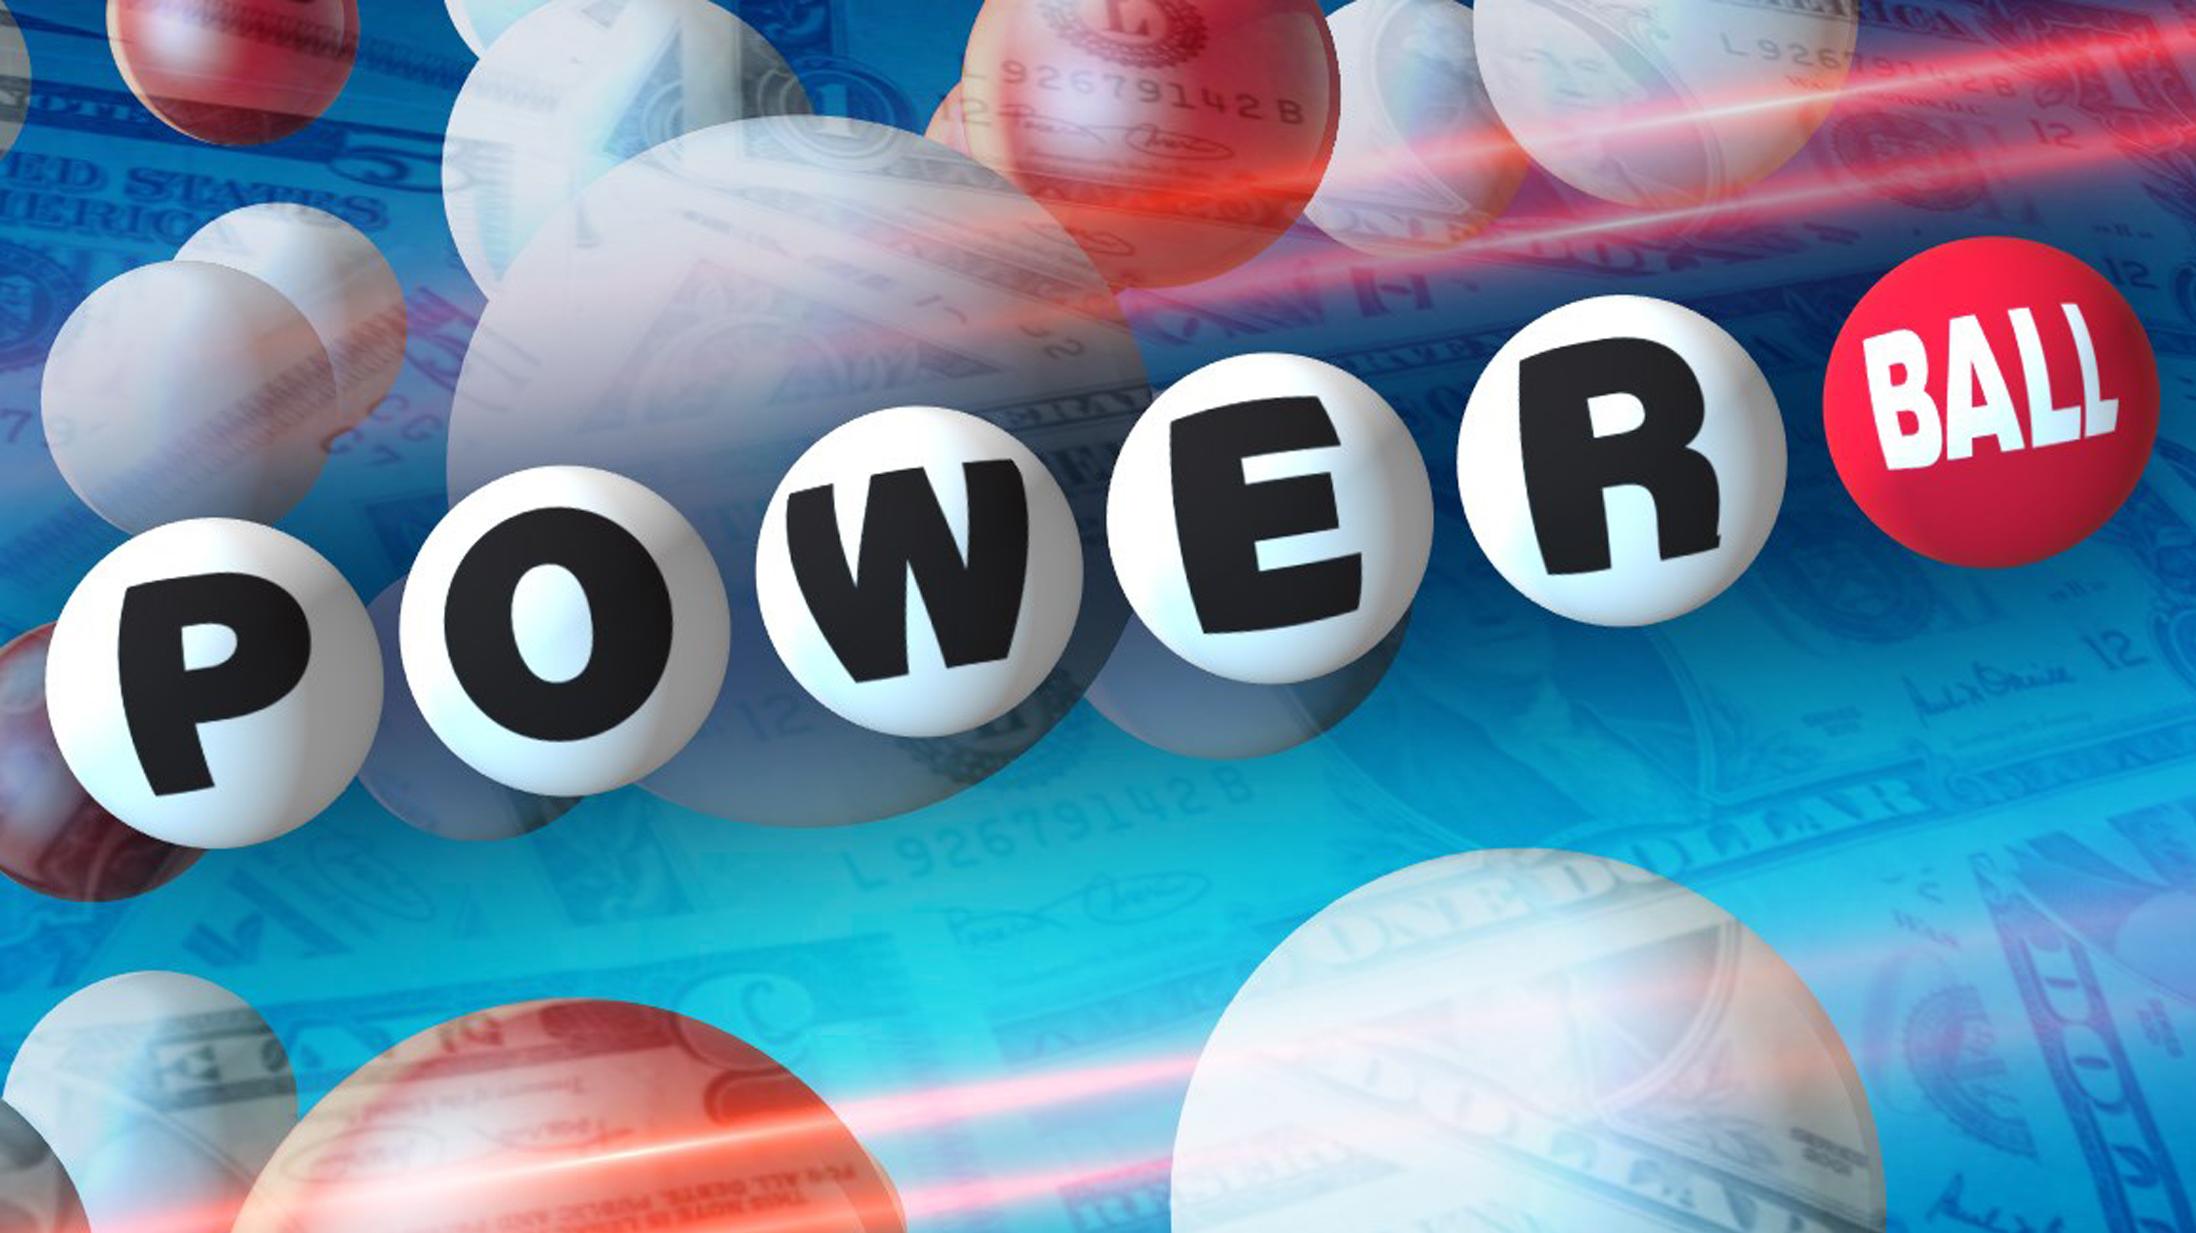 Powerball 01052015_1452640626828.jpg